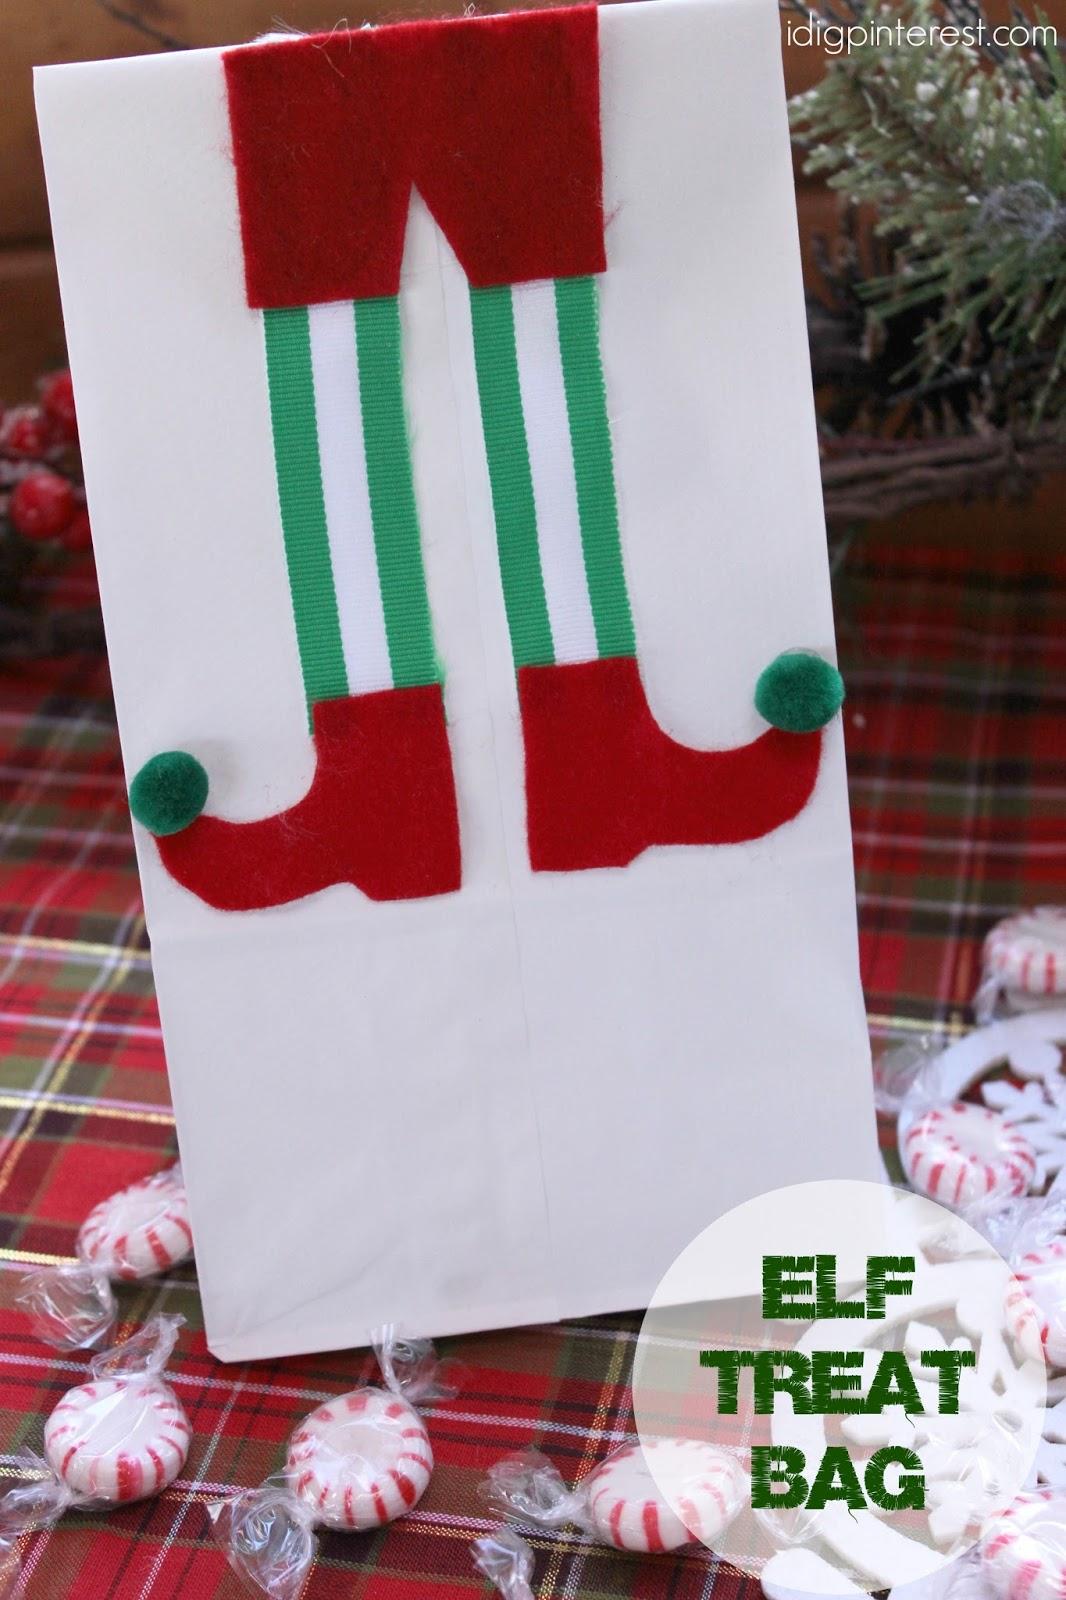 Elf Christmas Gift Bags.Elf Treat Bag I Dig Pinterest